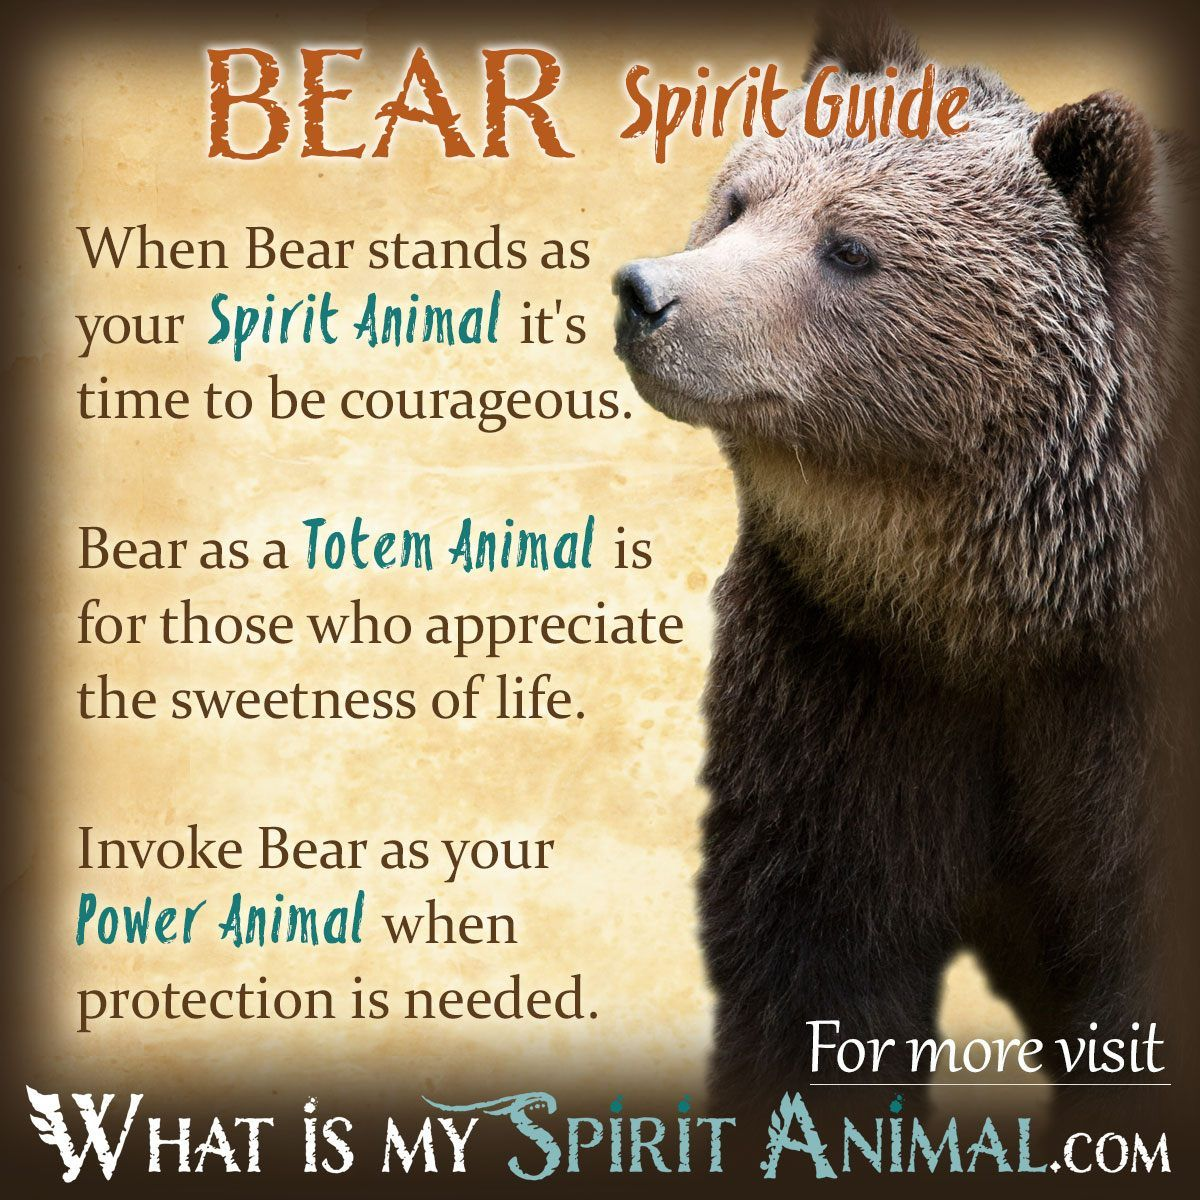 Bear symbolism meaning power animal animal totems and totems bear spirit animal totem power animal symbolism meaning 1200x1200 biocorpaavc